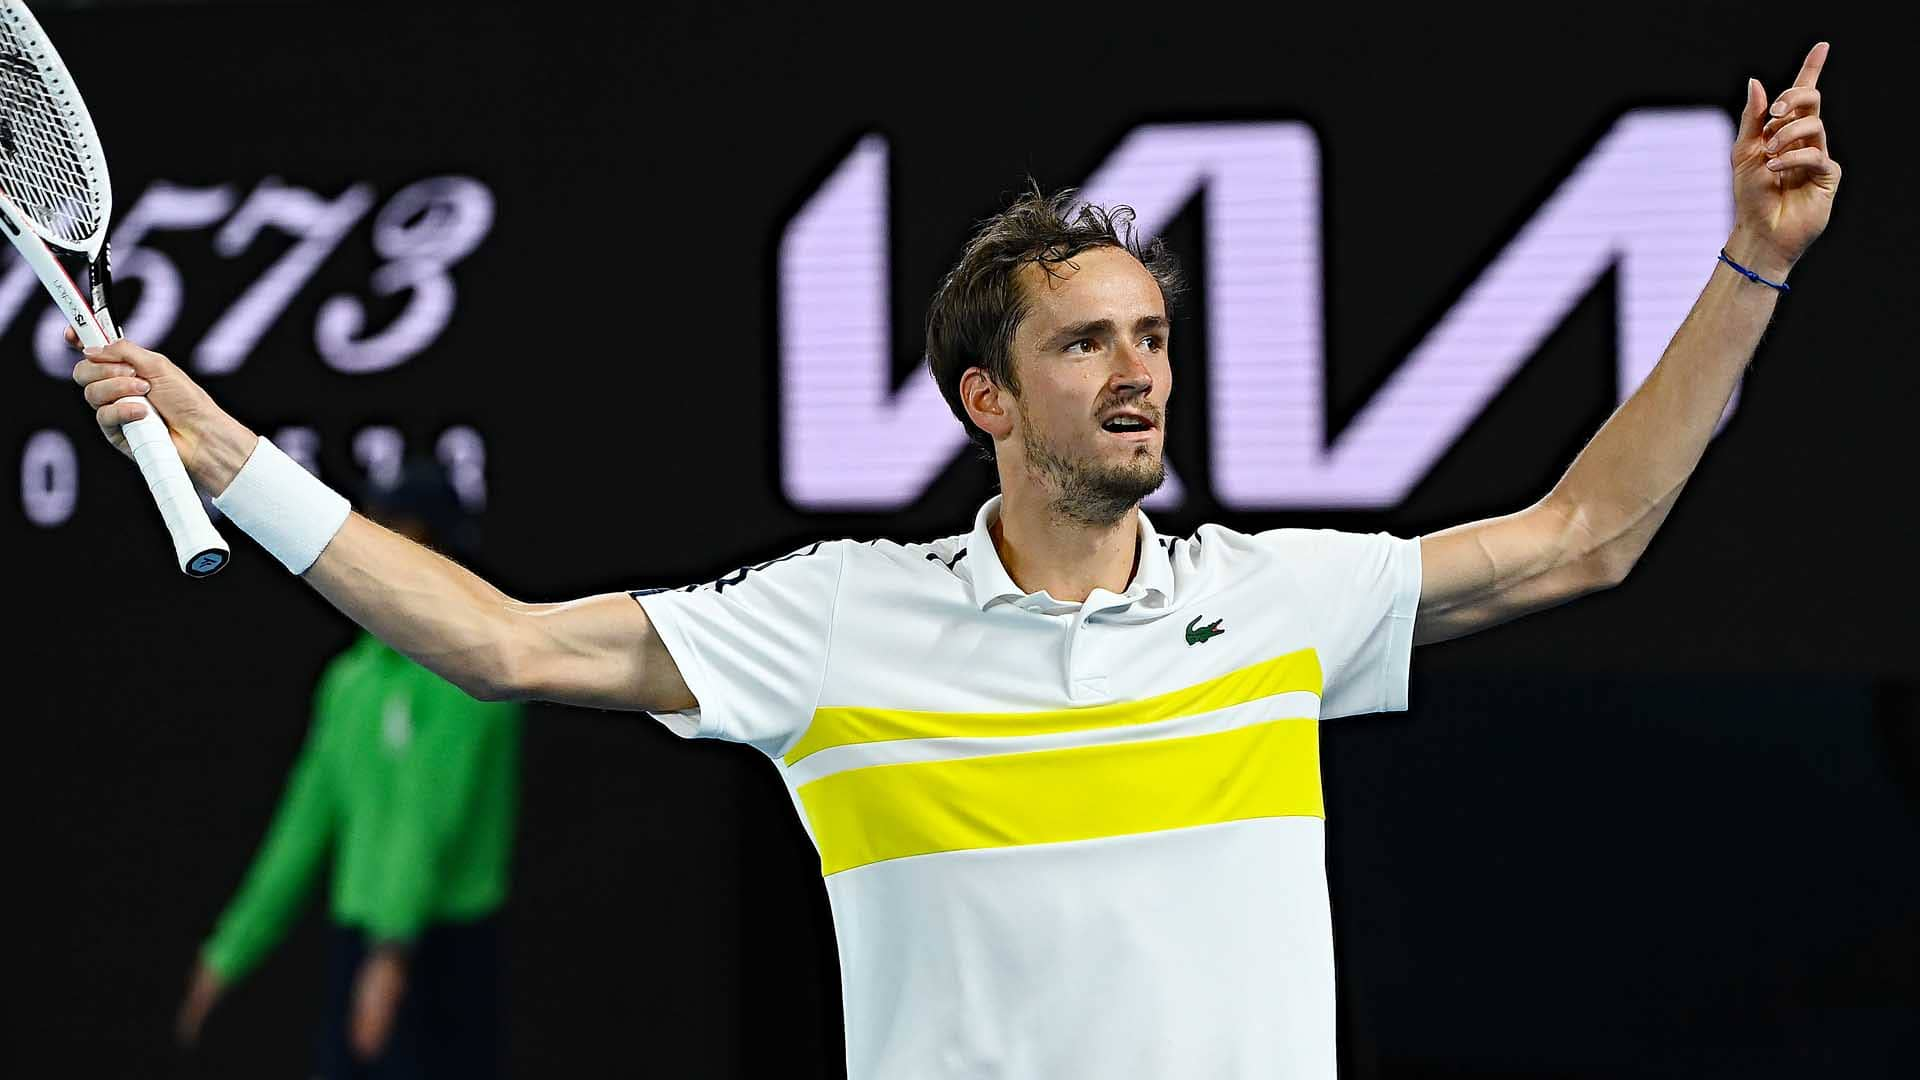 Marseille Open 2021: Daniil Medvedev vs. Matthew Ebden Tennis Preview and Prediction